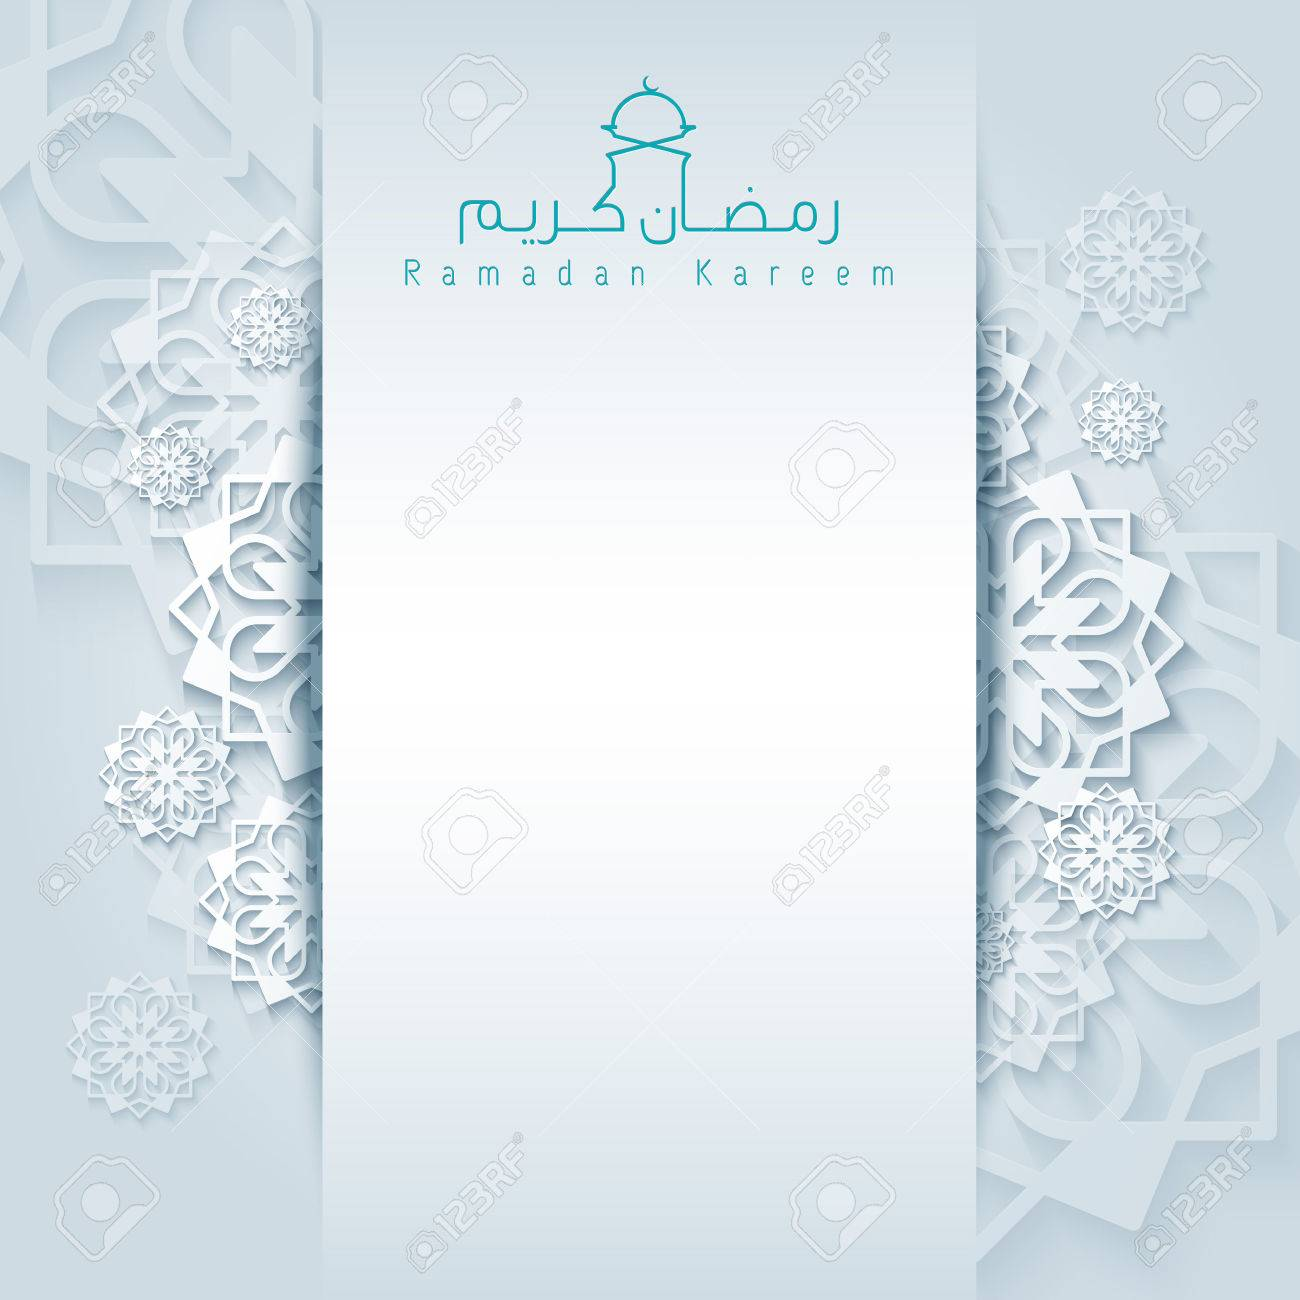 Ramadan kareem background greeting card with arabic pattern islamic calligraphy - 56801206